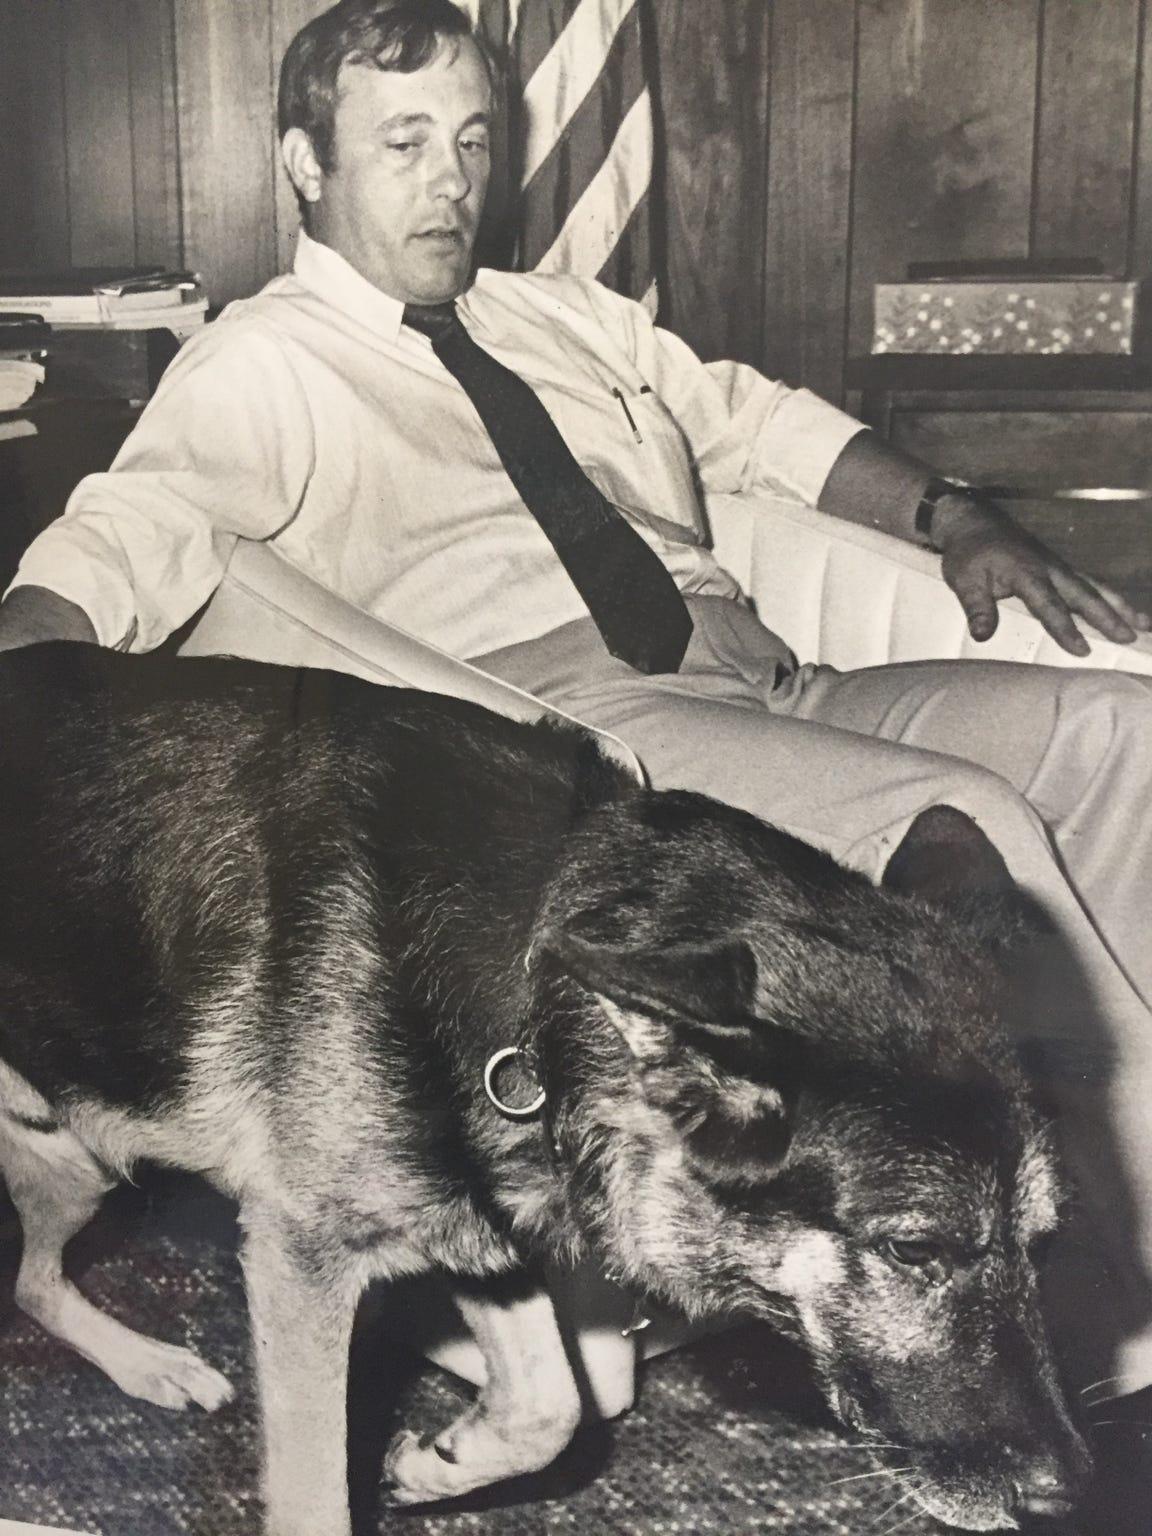 Discredited dog handler John Preston's fraudulent testimony